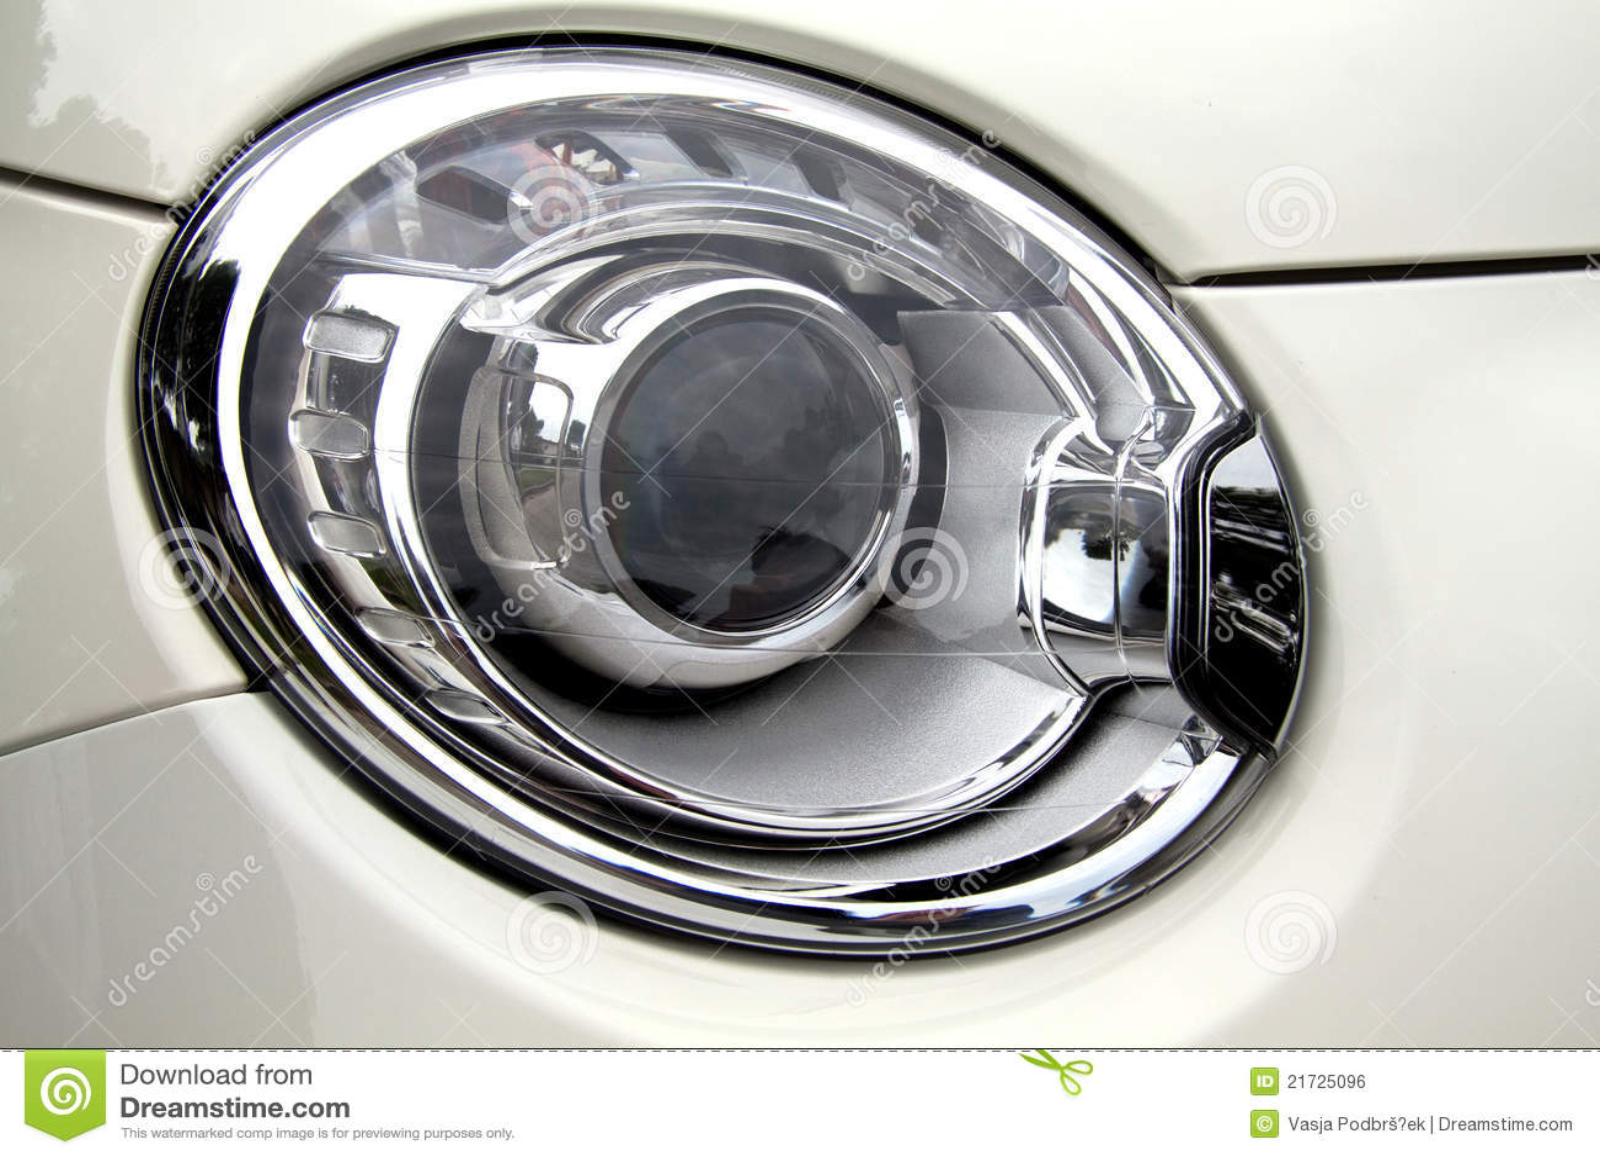 500 Abarth Headlight Royalty Free Stock Image Image